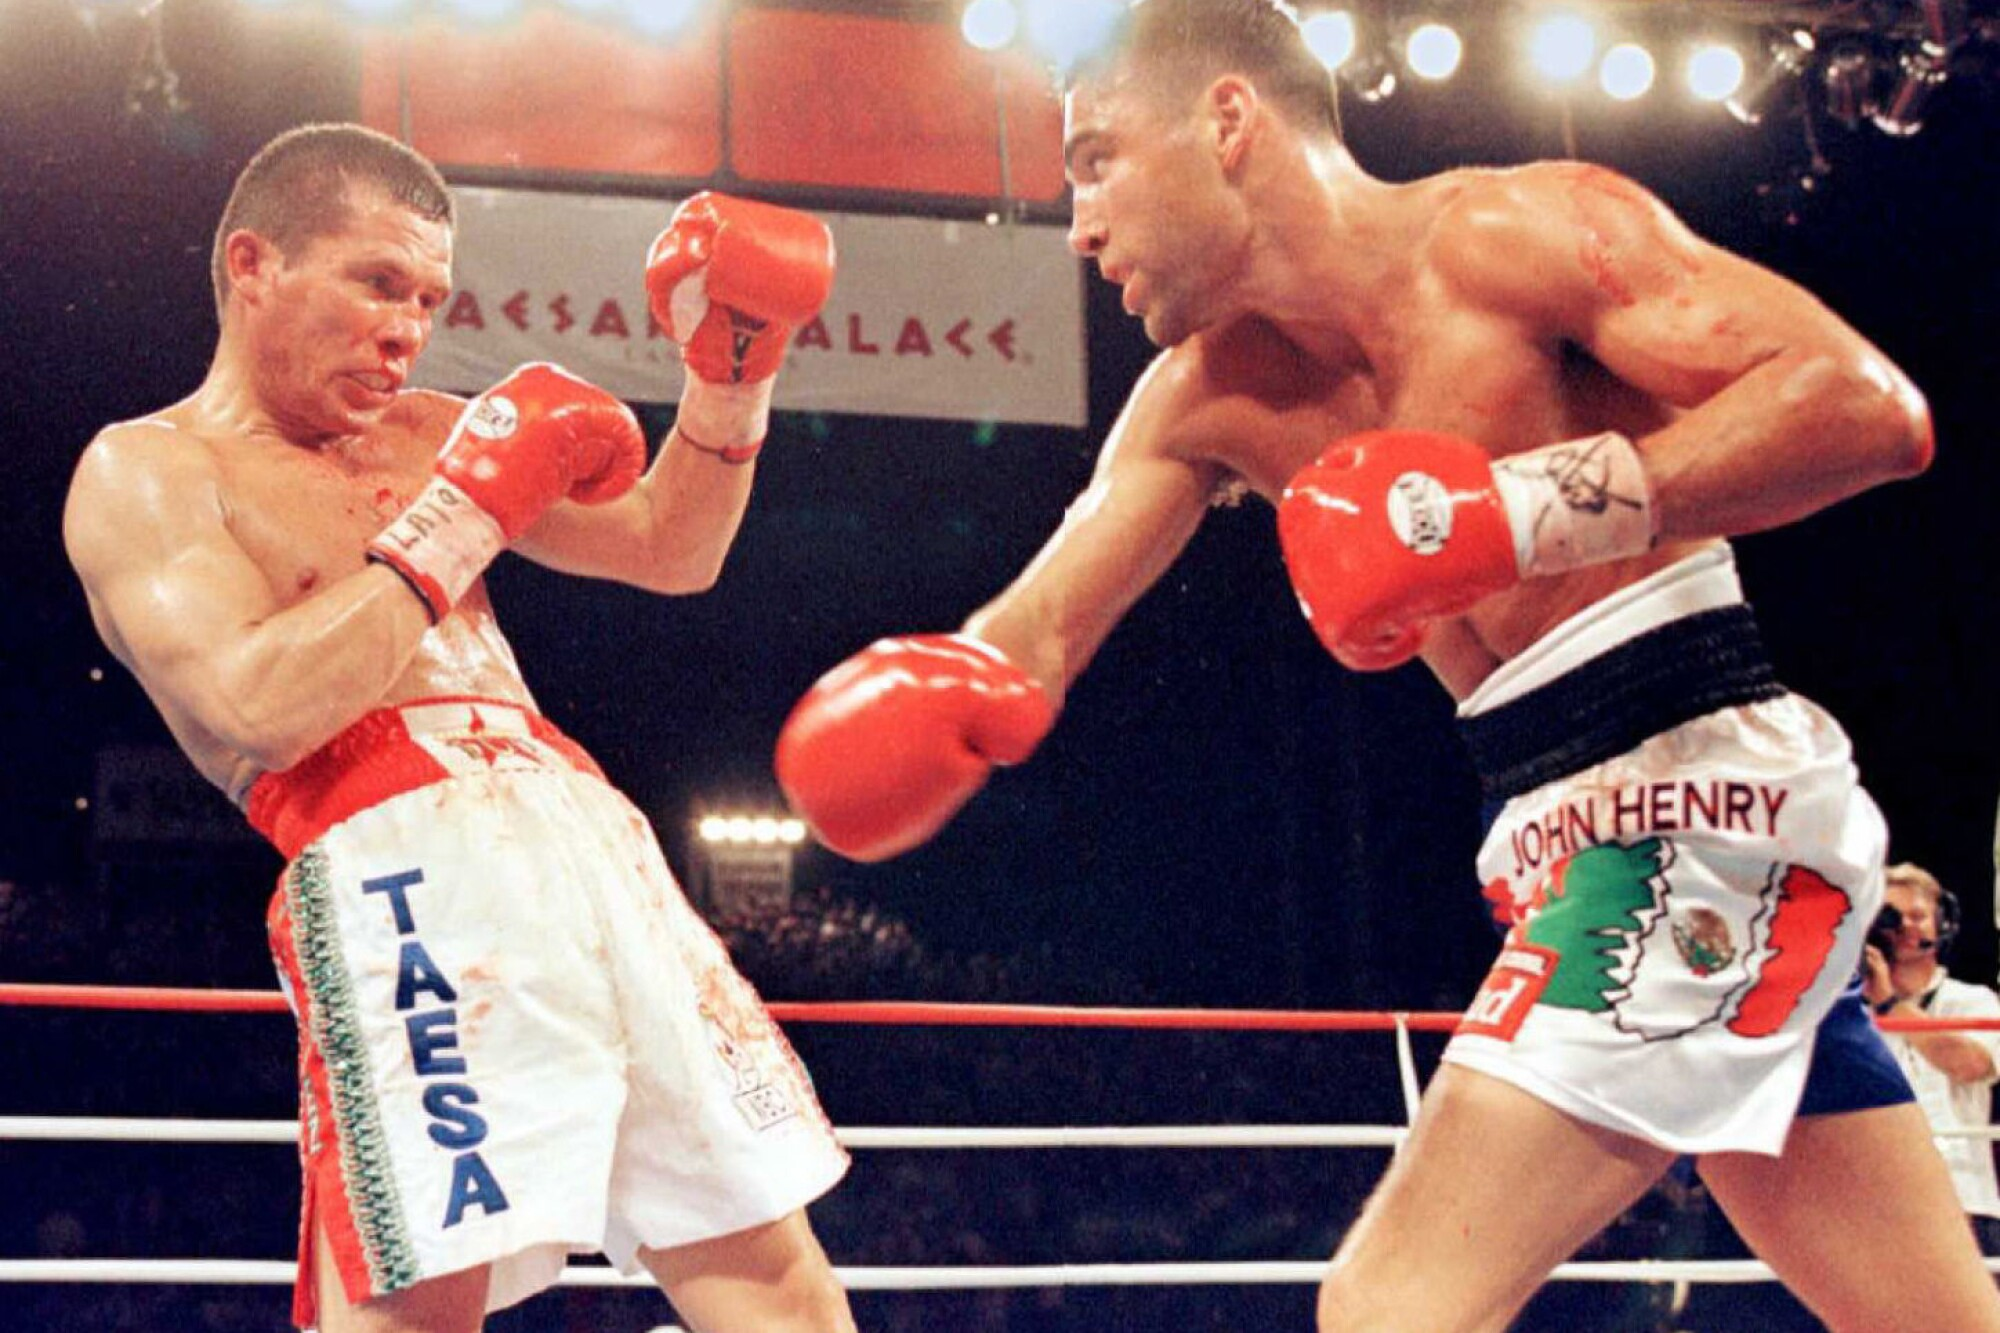 Julio Cesar Chavez reels from a left by challenger Oscar de la Hoya.